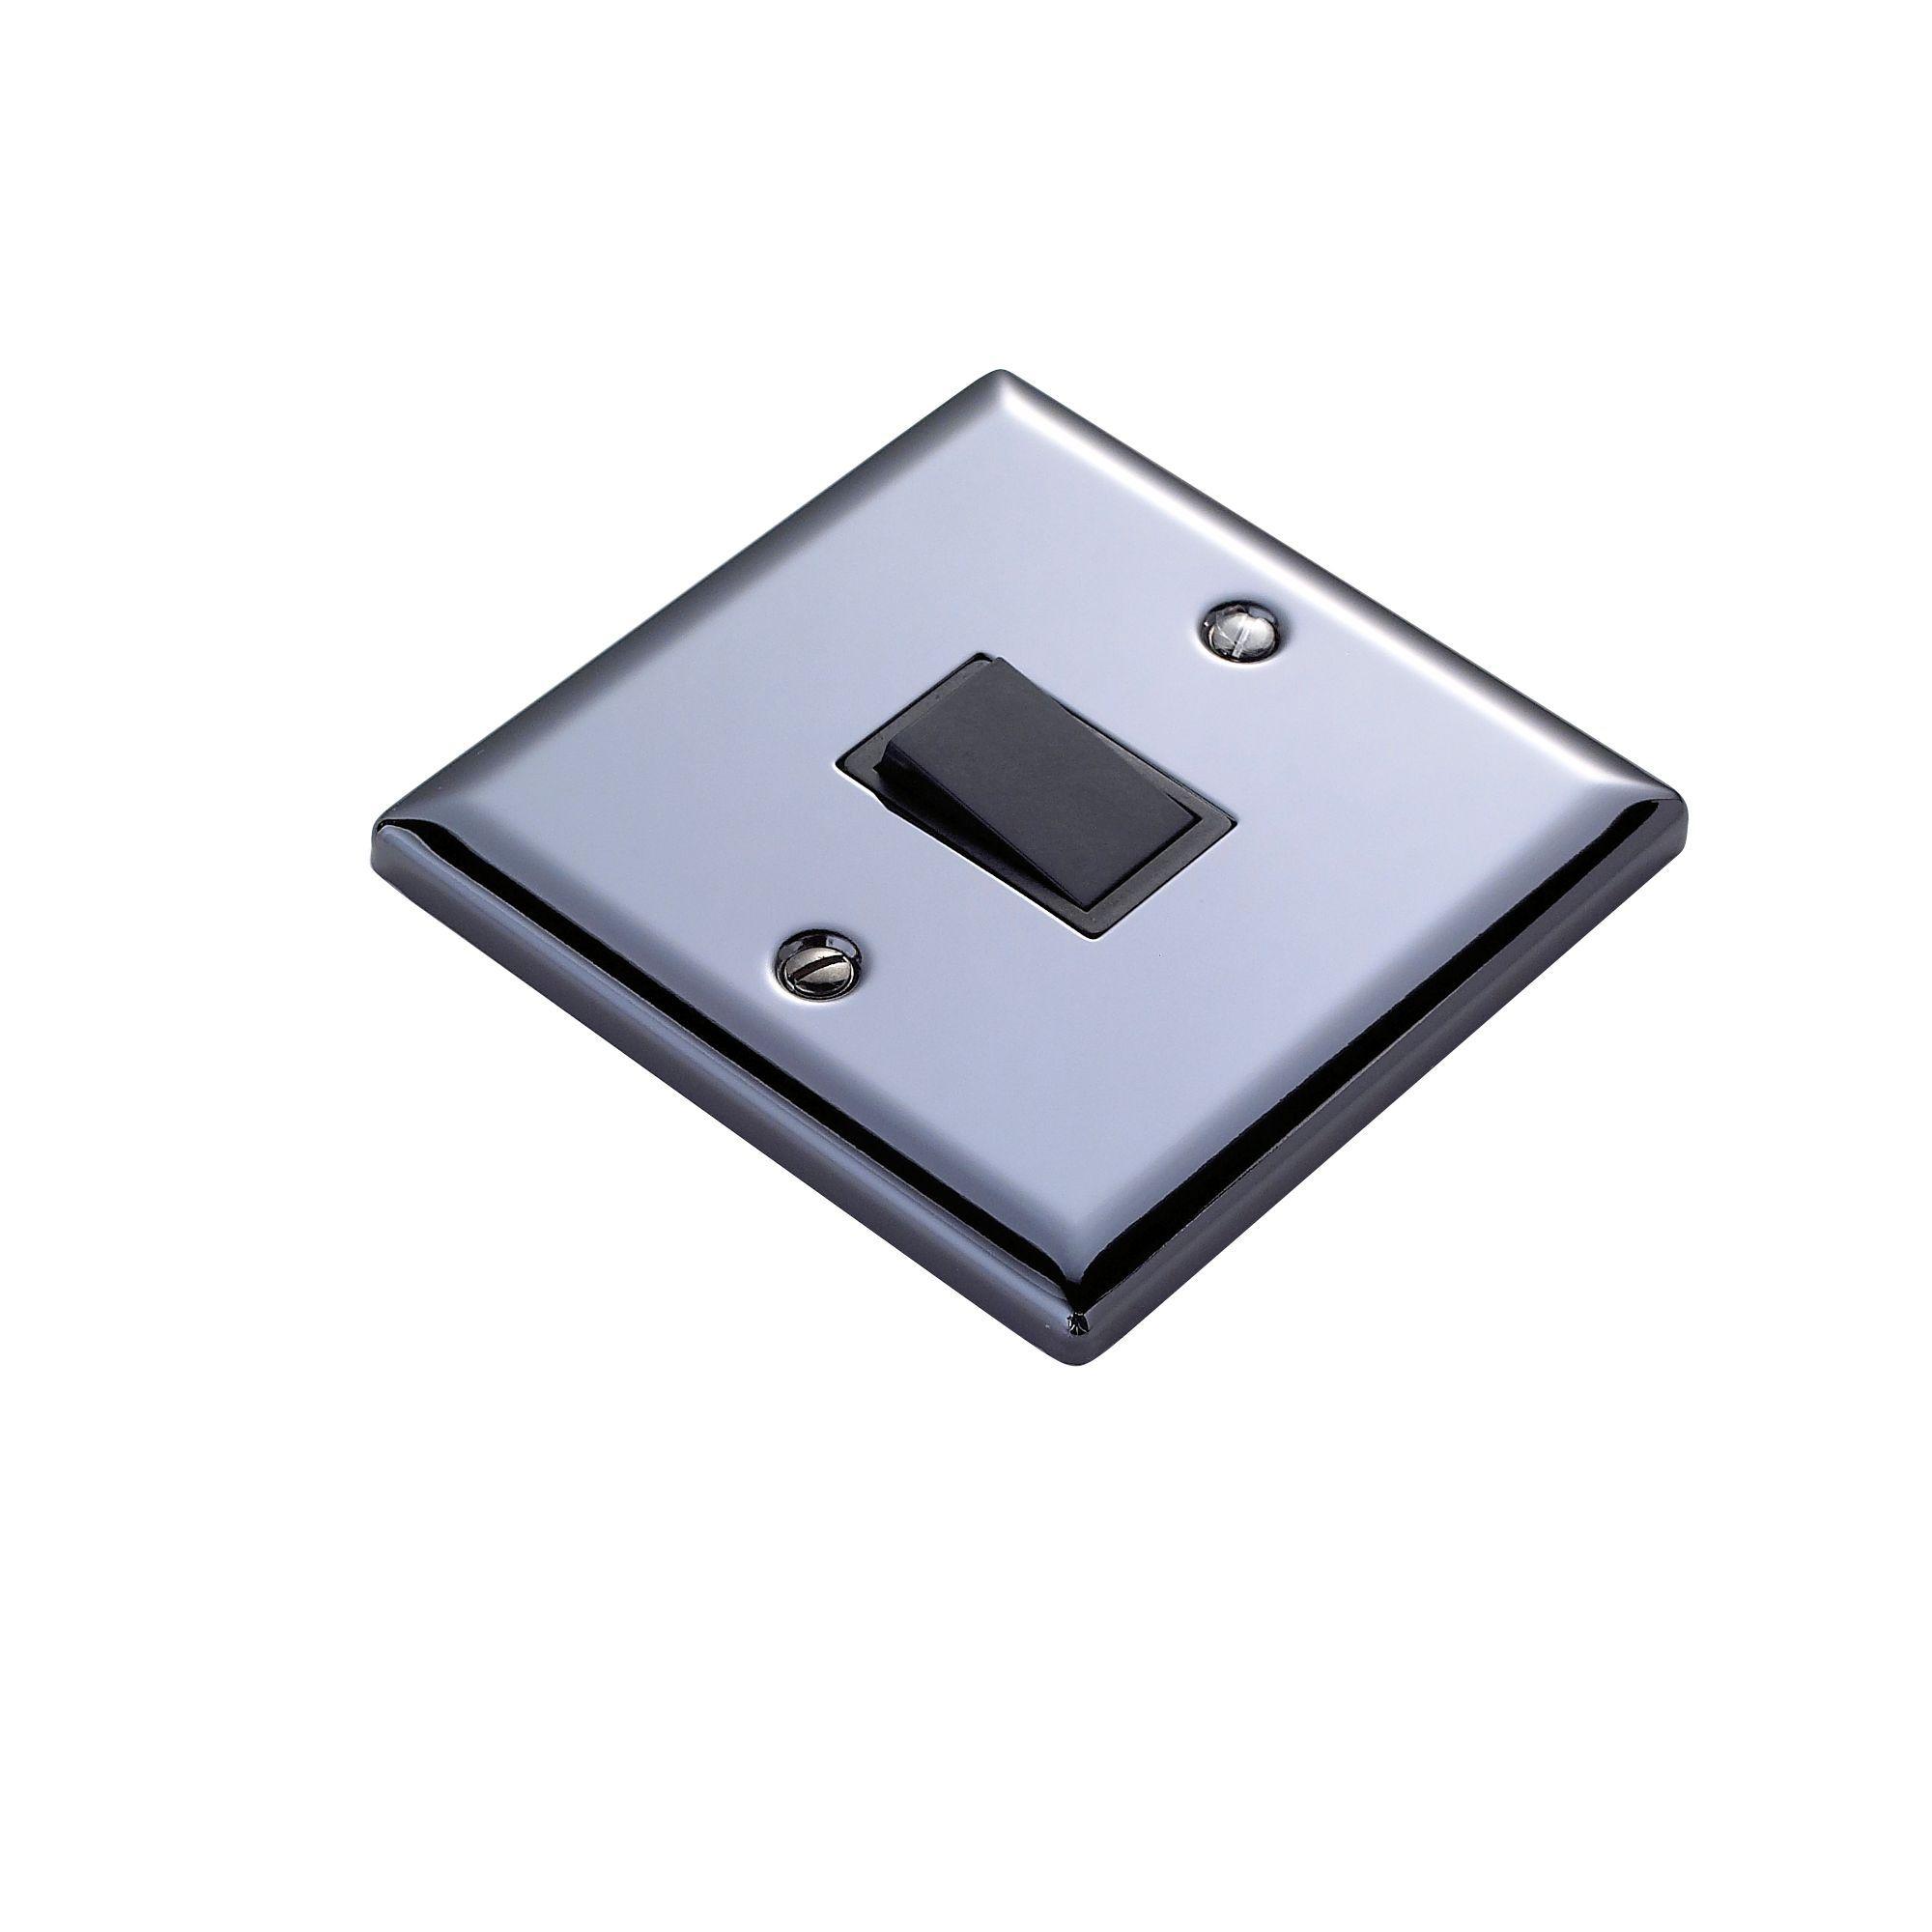 Volex 10a 2-way Single Polished Iridium Black Intermediate Switch